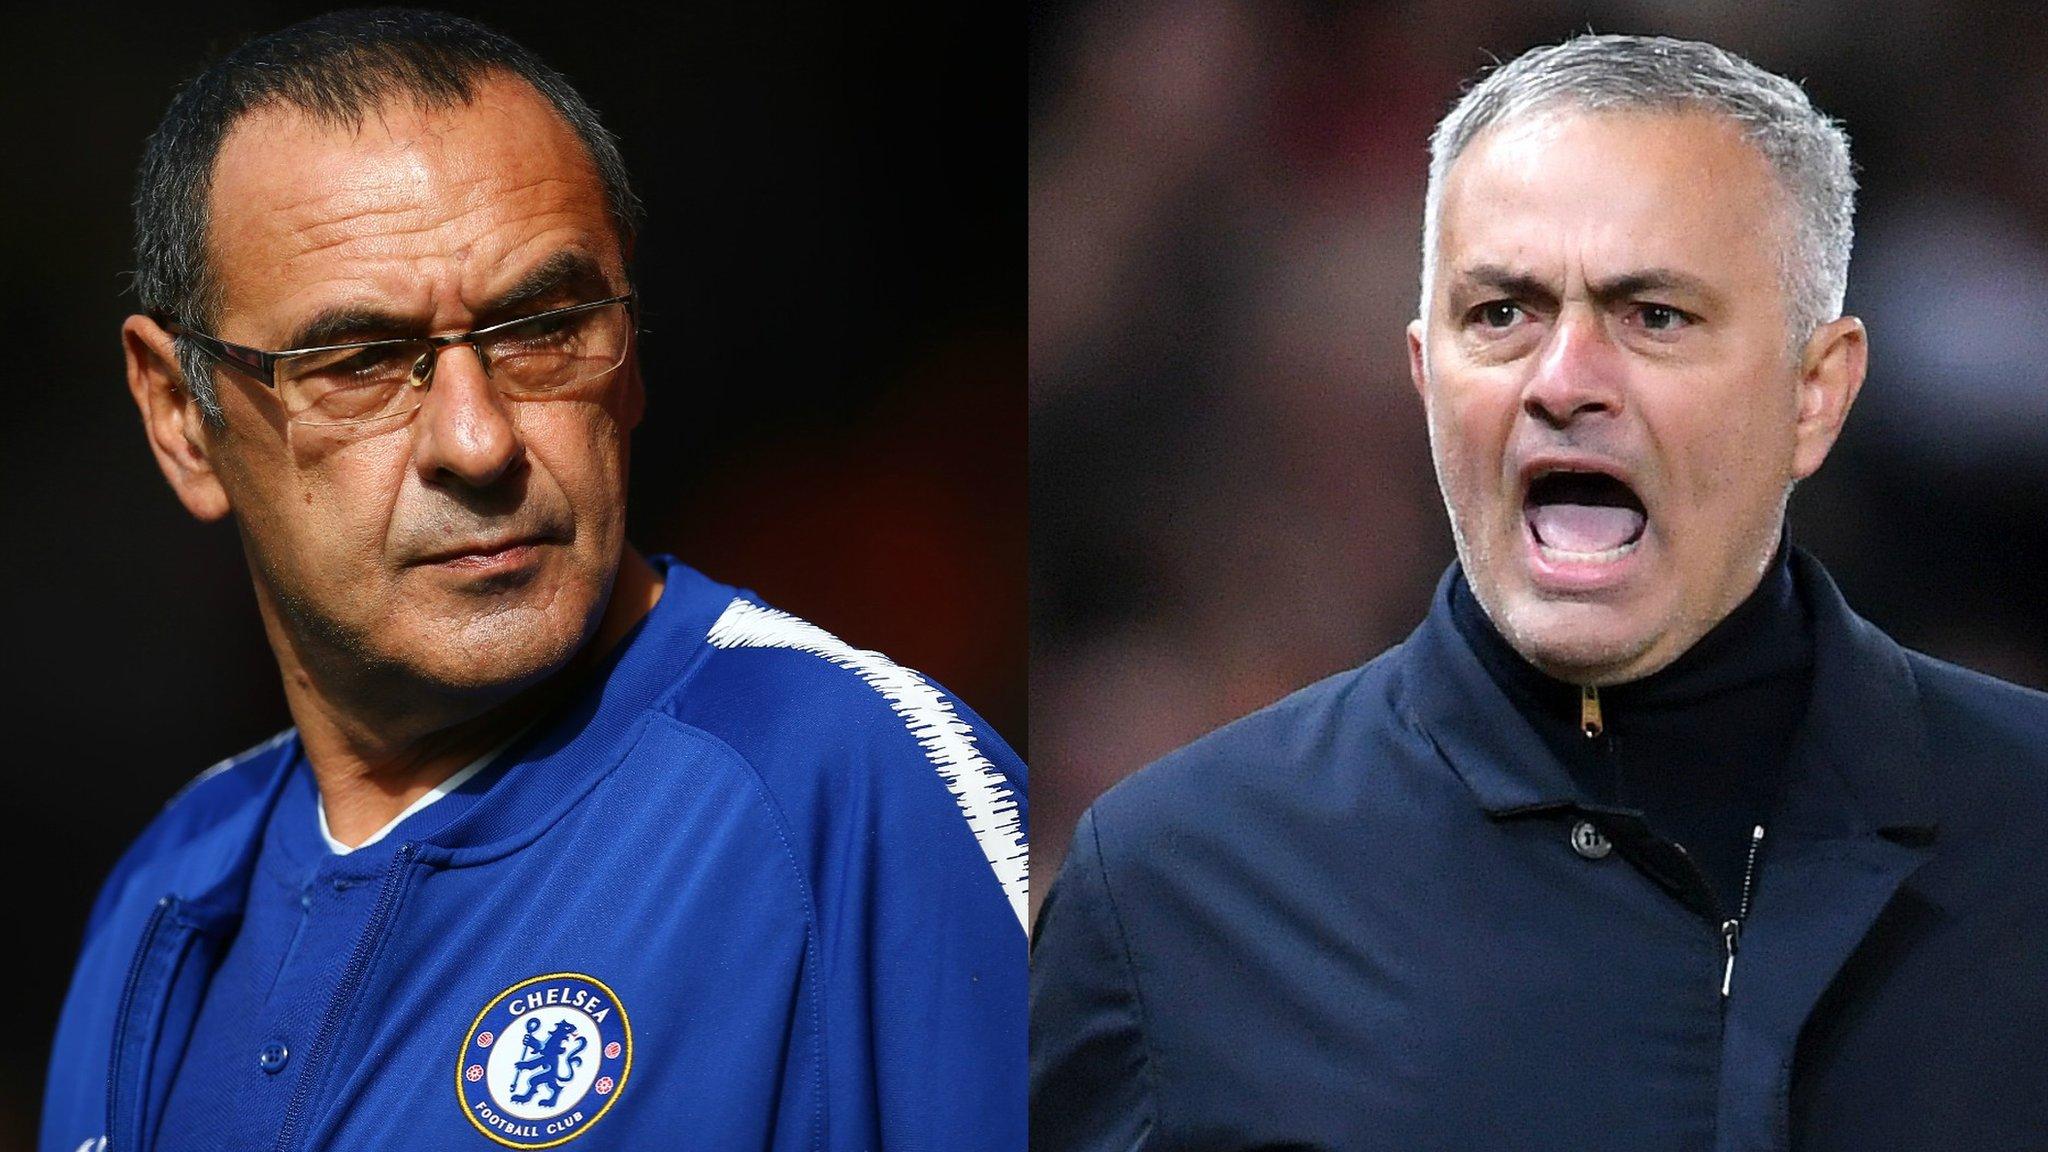 Maurizio Sarri: Chelsea boss says Man Utd's Jose Mourinho deserves respect | BBC